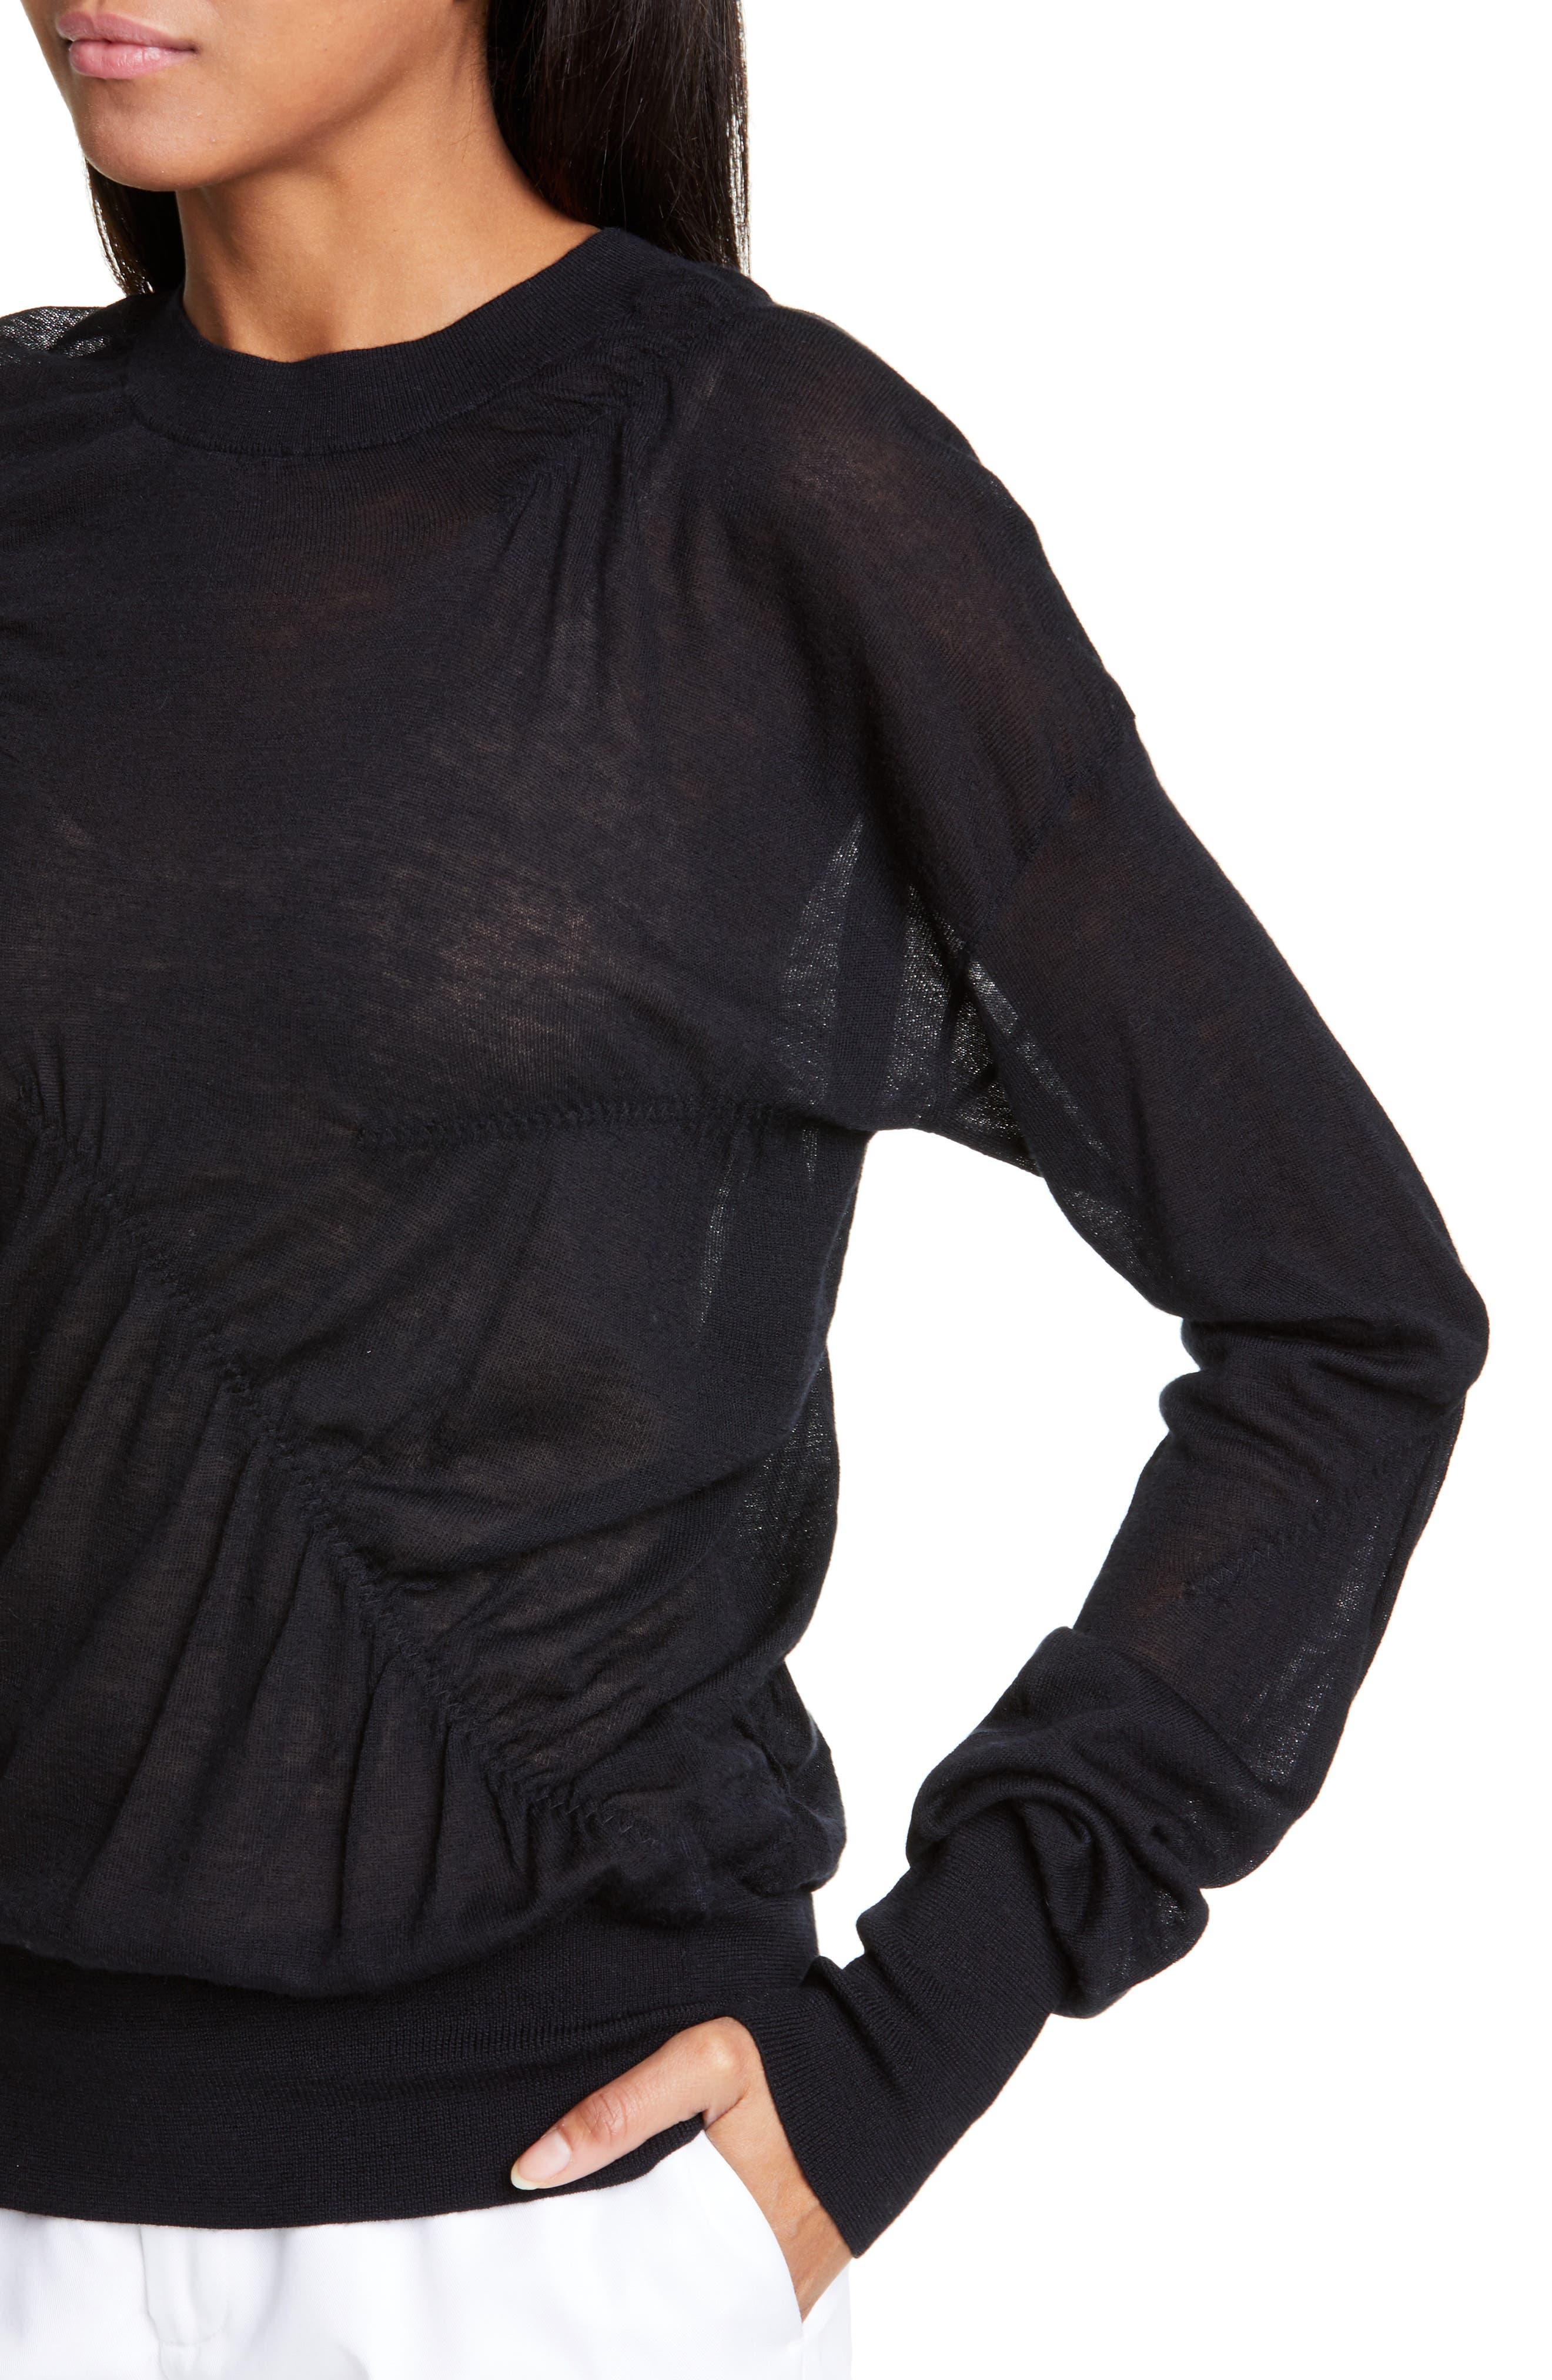 HELMUT LANG, Ruched Seam Detail Cashmere Sweater, Alternate thumbnail 4, color, BLACK